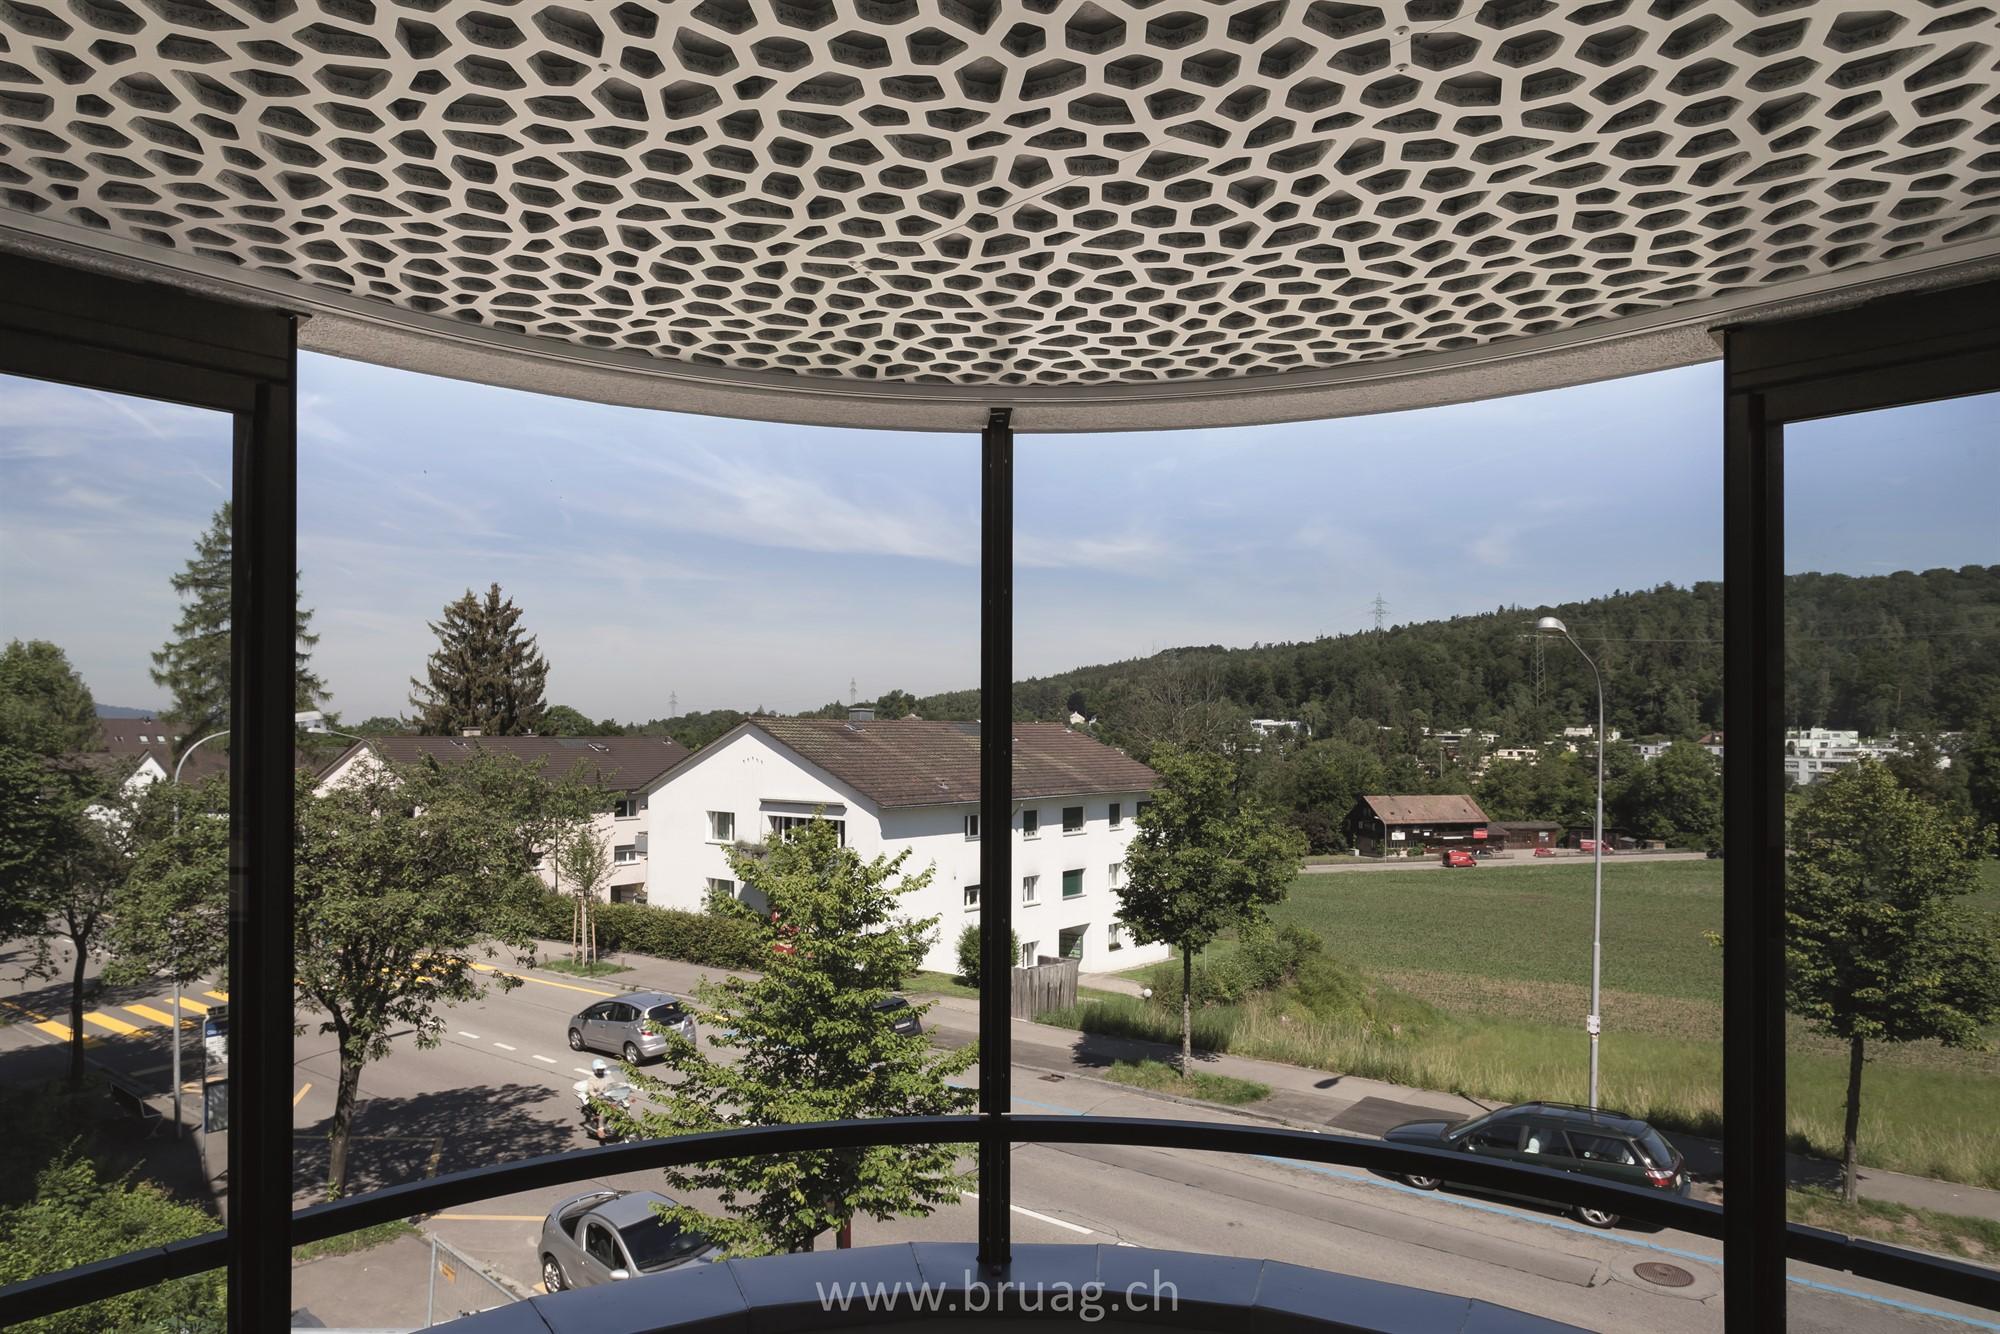 Balcony Acoustics Bruag_Formboard top pine 18mm_Perforation 50200_Project Oasis Zürich_a4D Architekte_Photo Credit David Halter_1.jpg